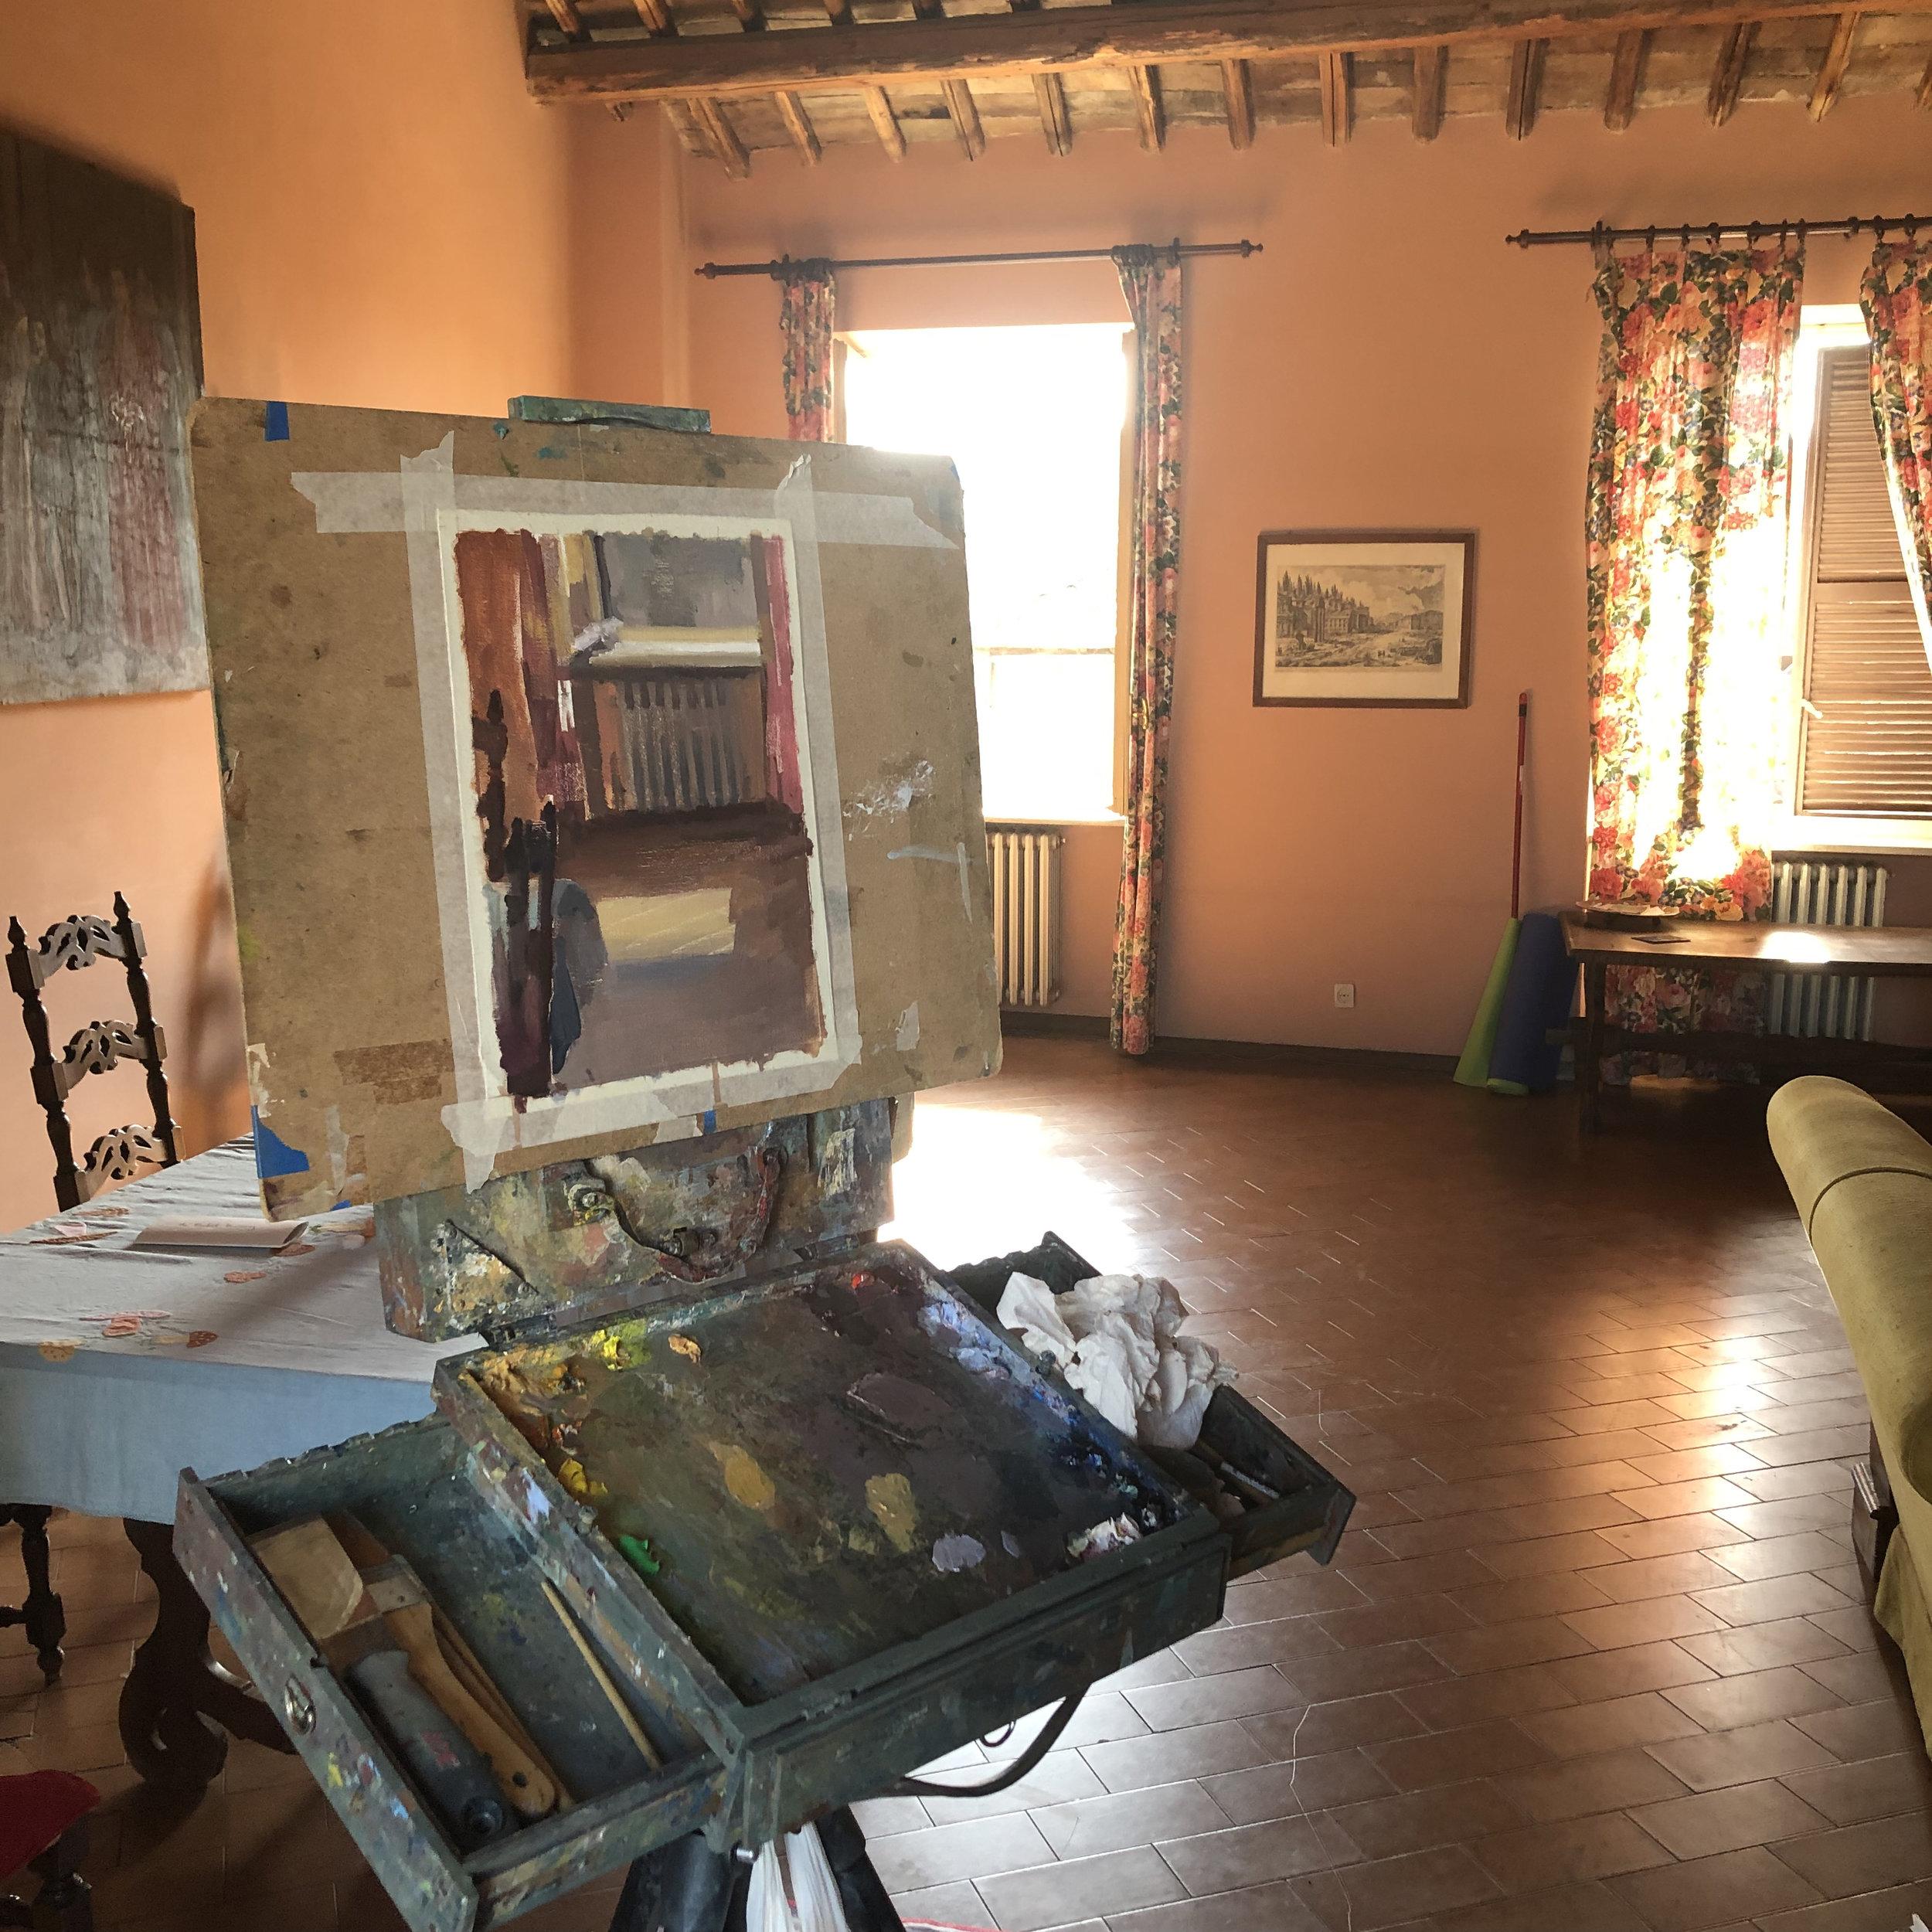 palazzo living room w easel 1.jpg